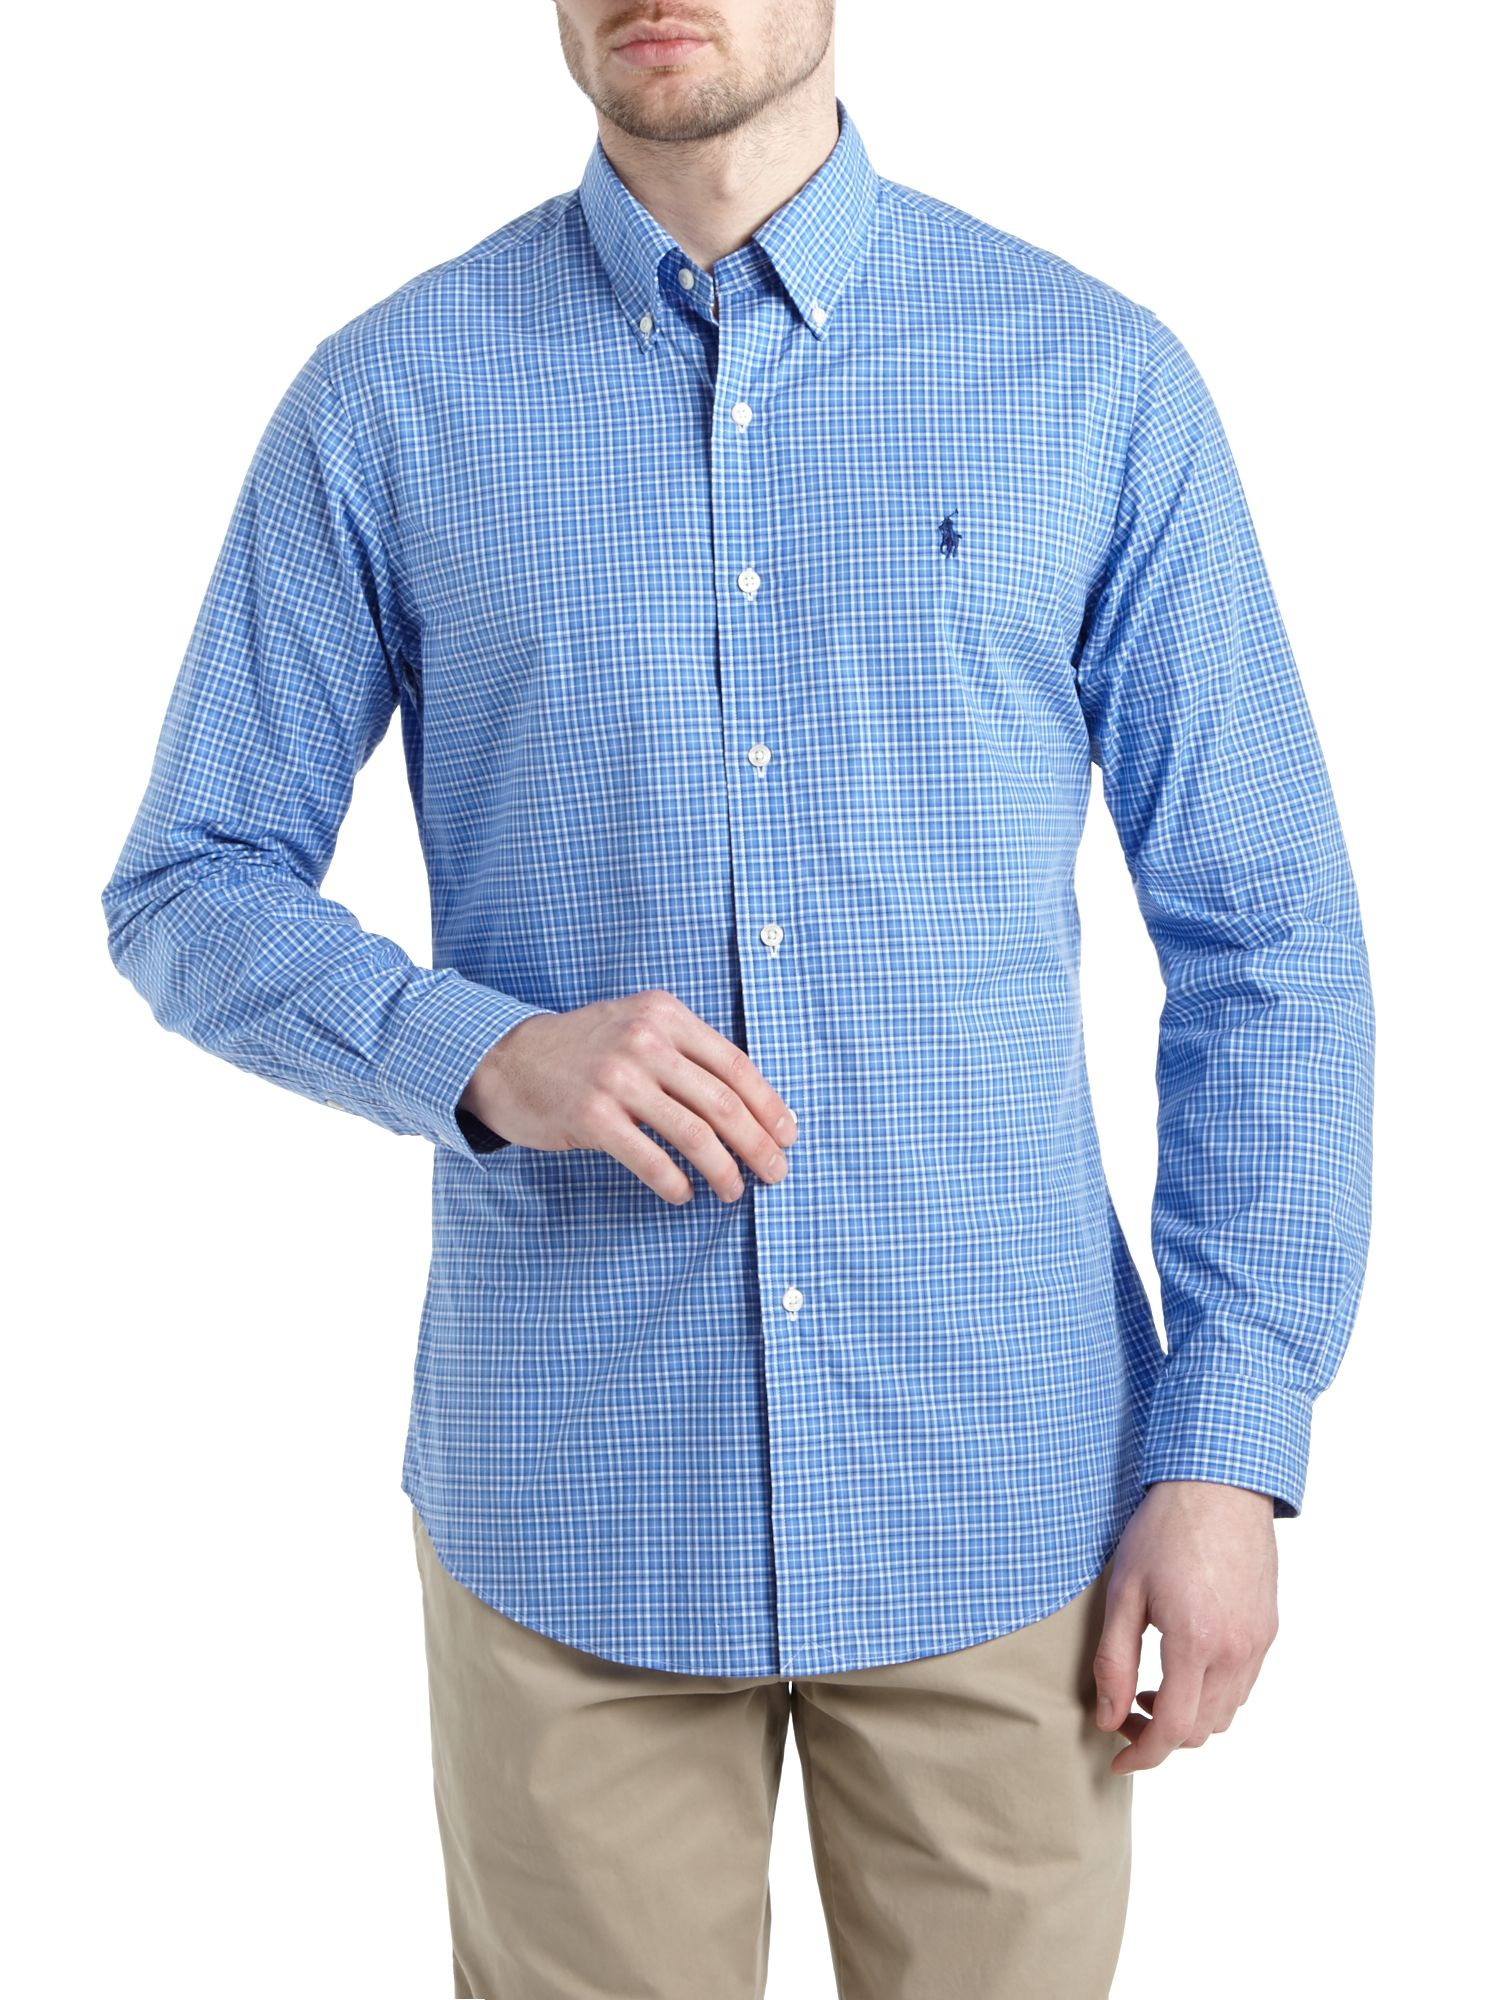 Polo ralph lauren long sleeve check poplin shirt in white for Long sleeve poplin shirt